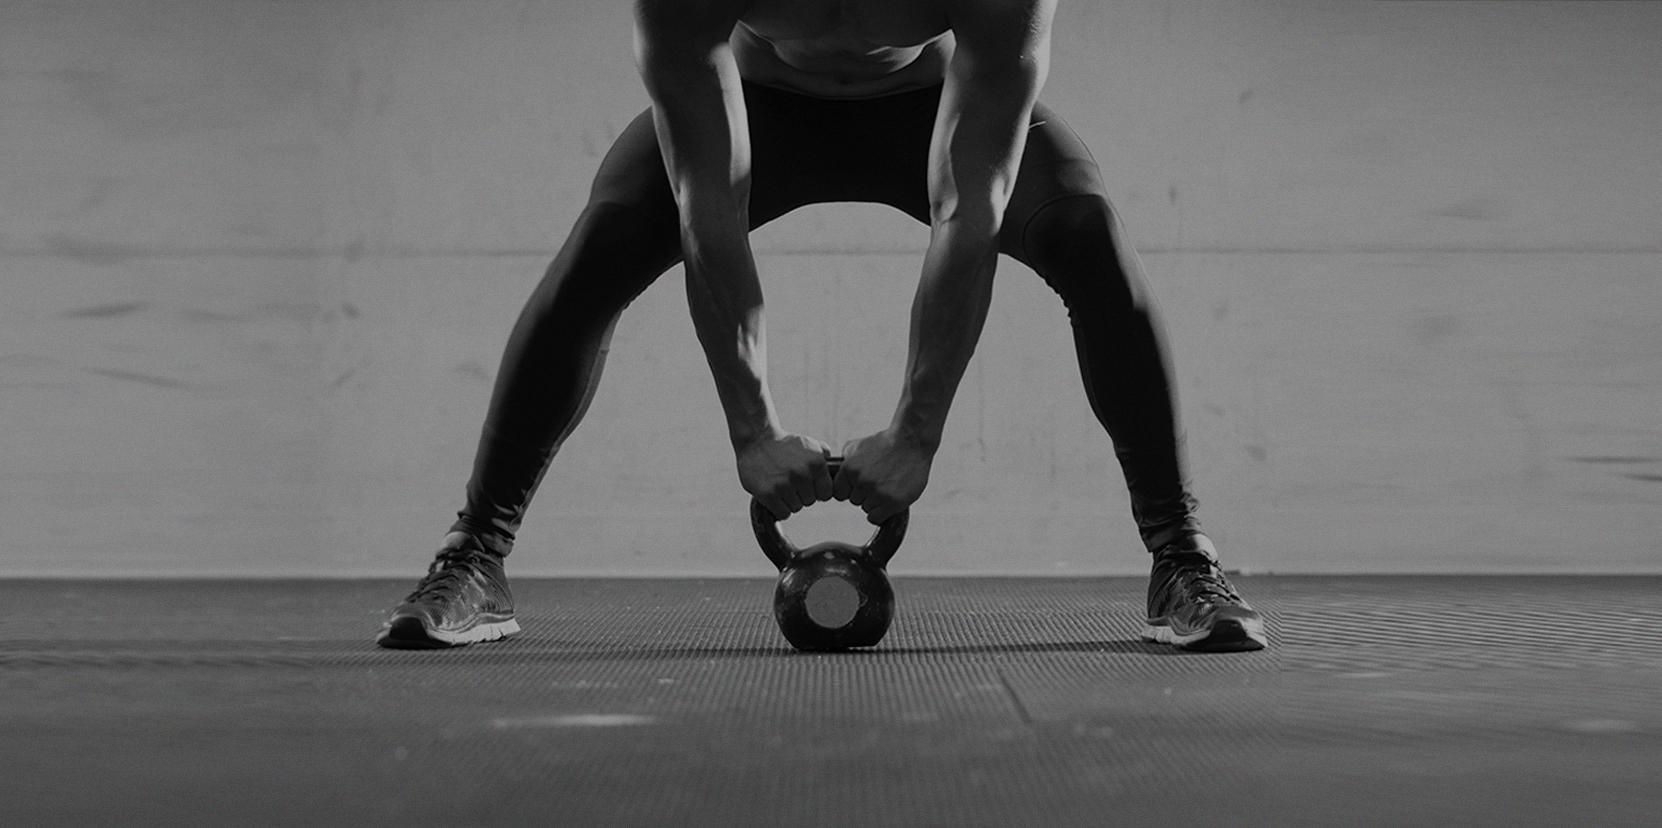 Motivatr-workingout-is-tough-01.jpg